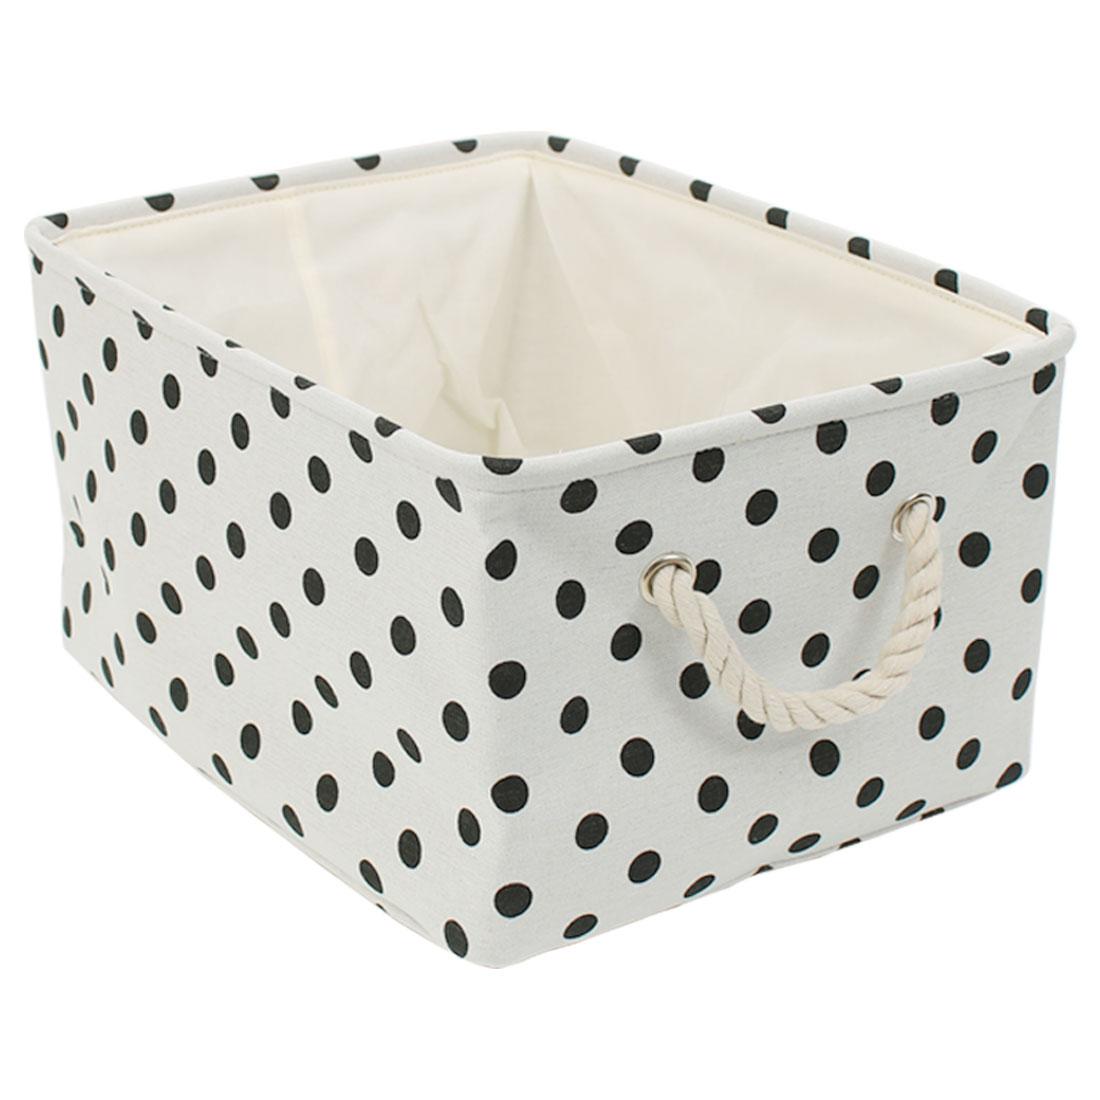 Foldable Canvas Fabric Storage Basket Bin w Handles Drawstring Cover